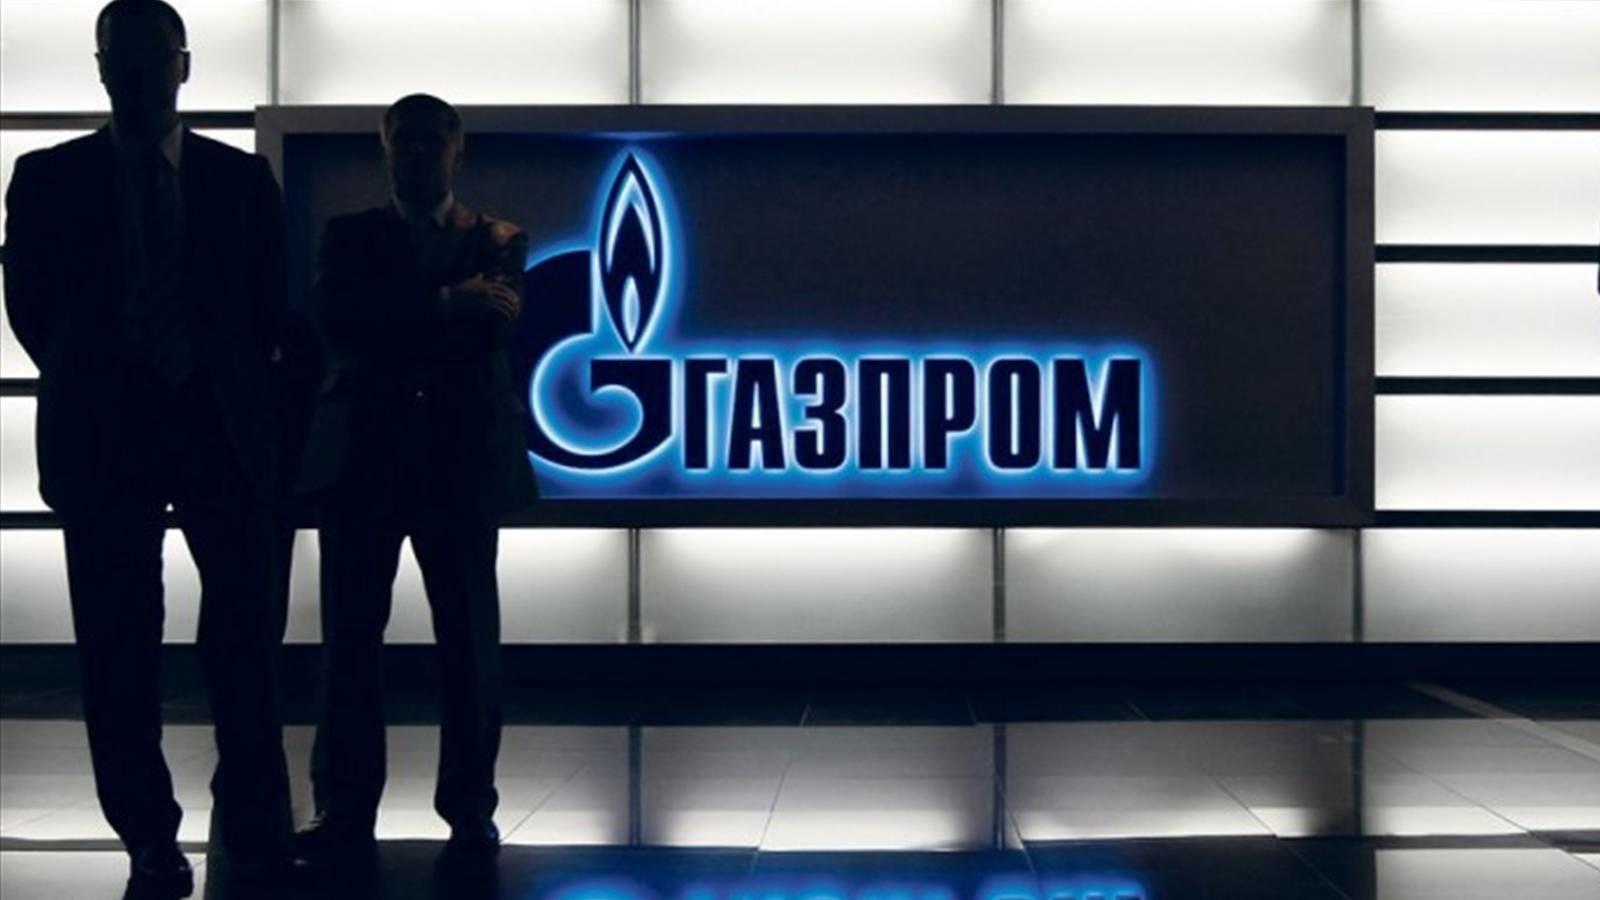 ВПетербурге скончался топ-менеджер «дочки» «Газпрома»